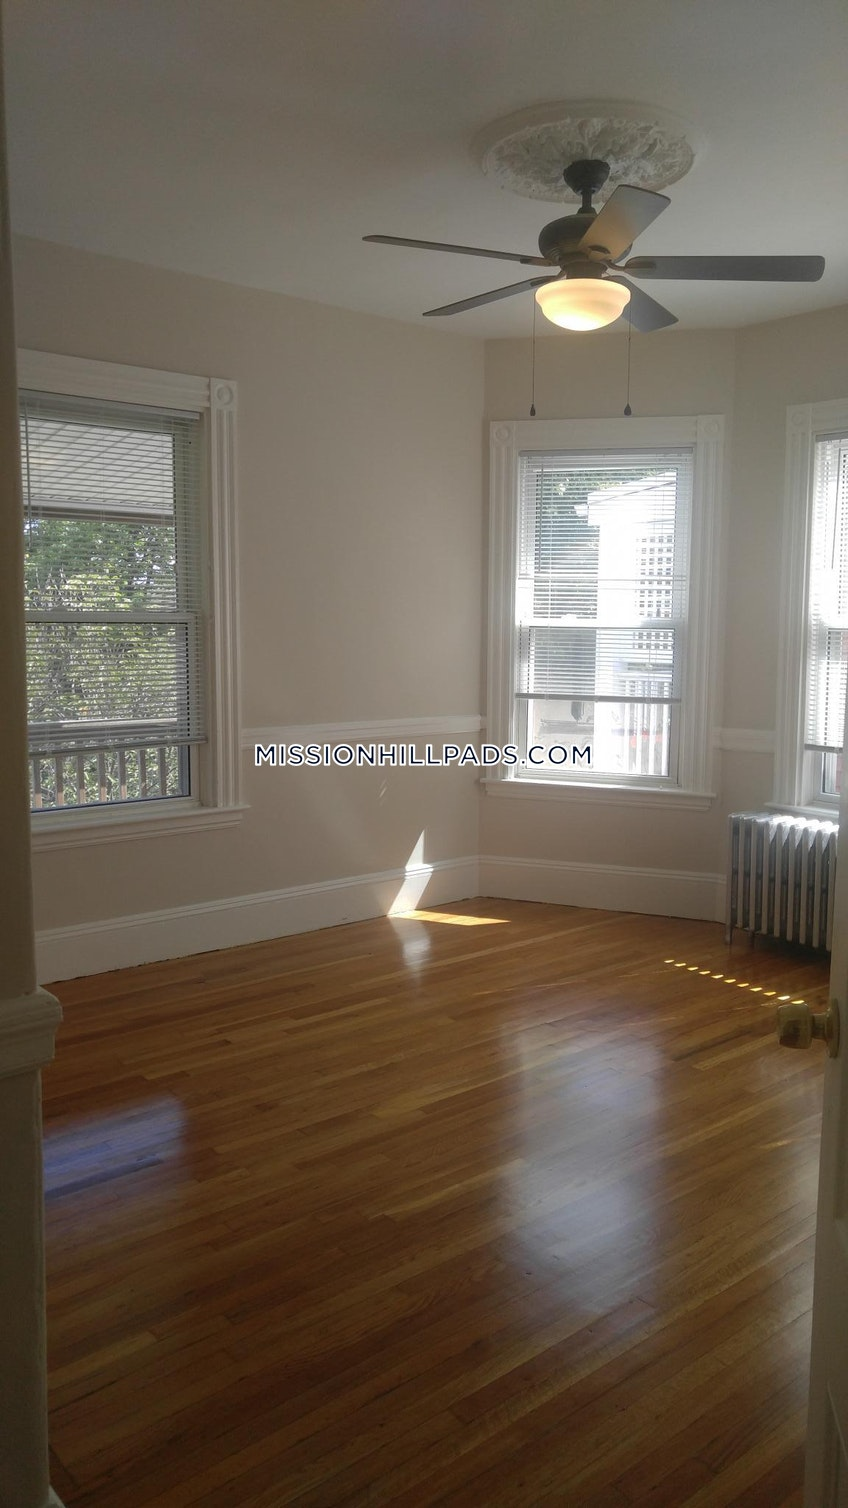 BOSTON - MISSION HILL - $4,500 /month